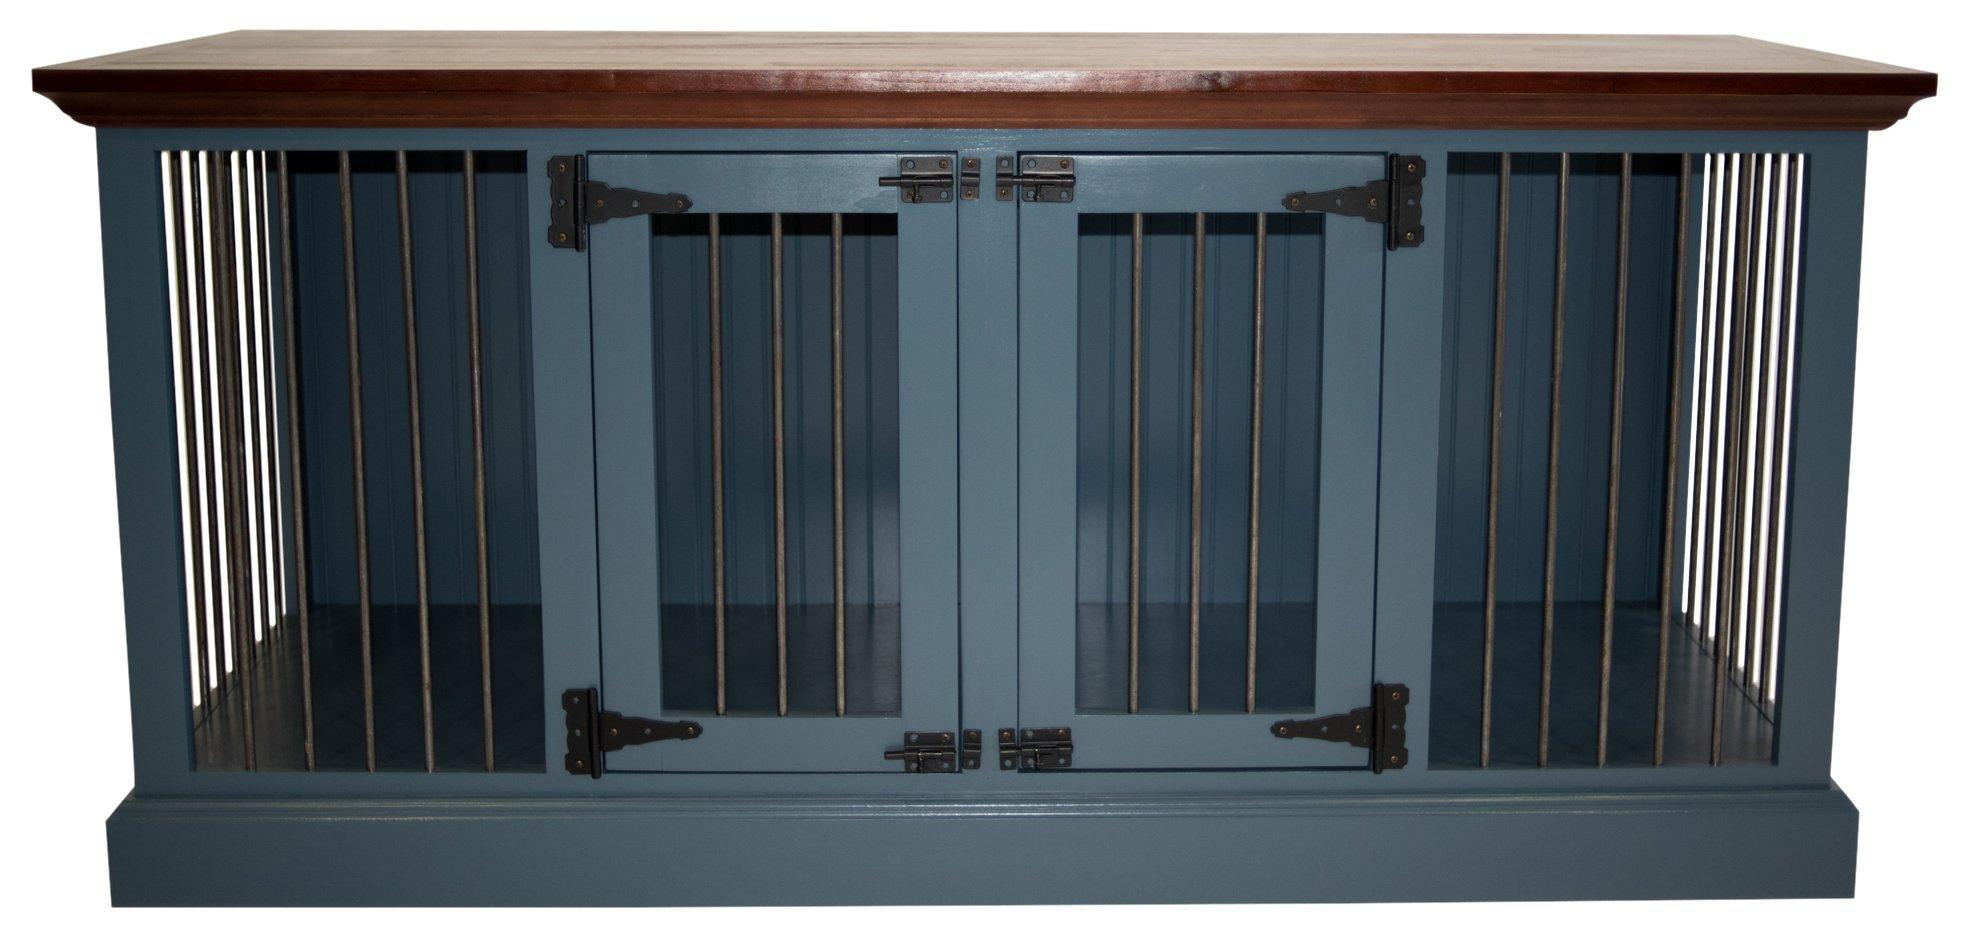 Eagle Furniture Manufacturing K9SD-302364-TTCR K9 Crate, Tempting Turquoise by Eagle Furniture Manufacturing